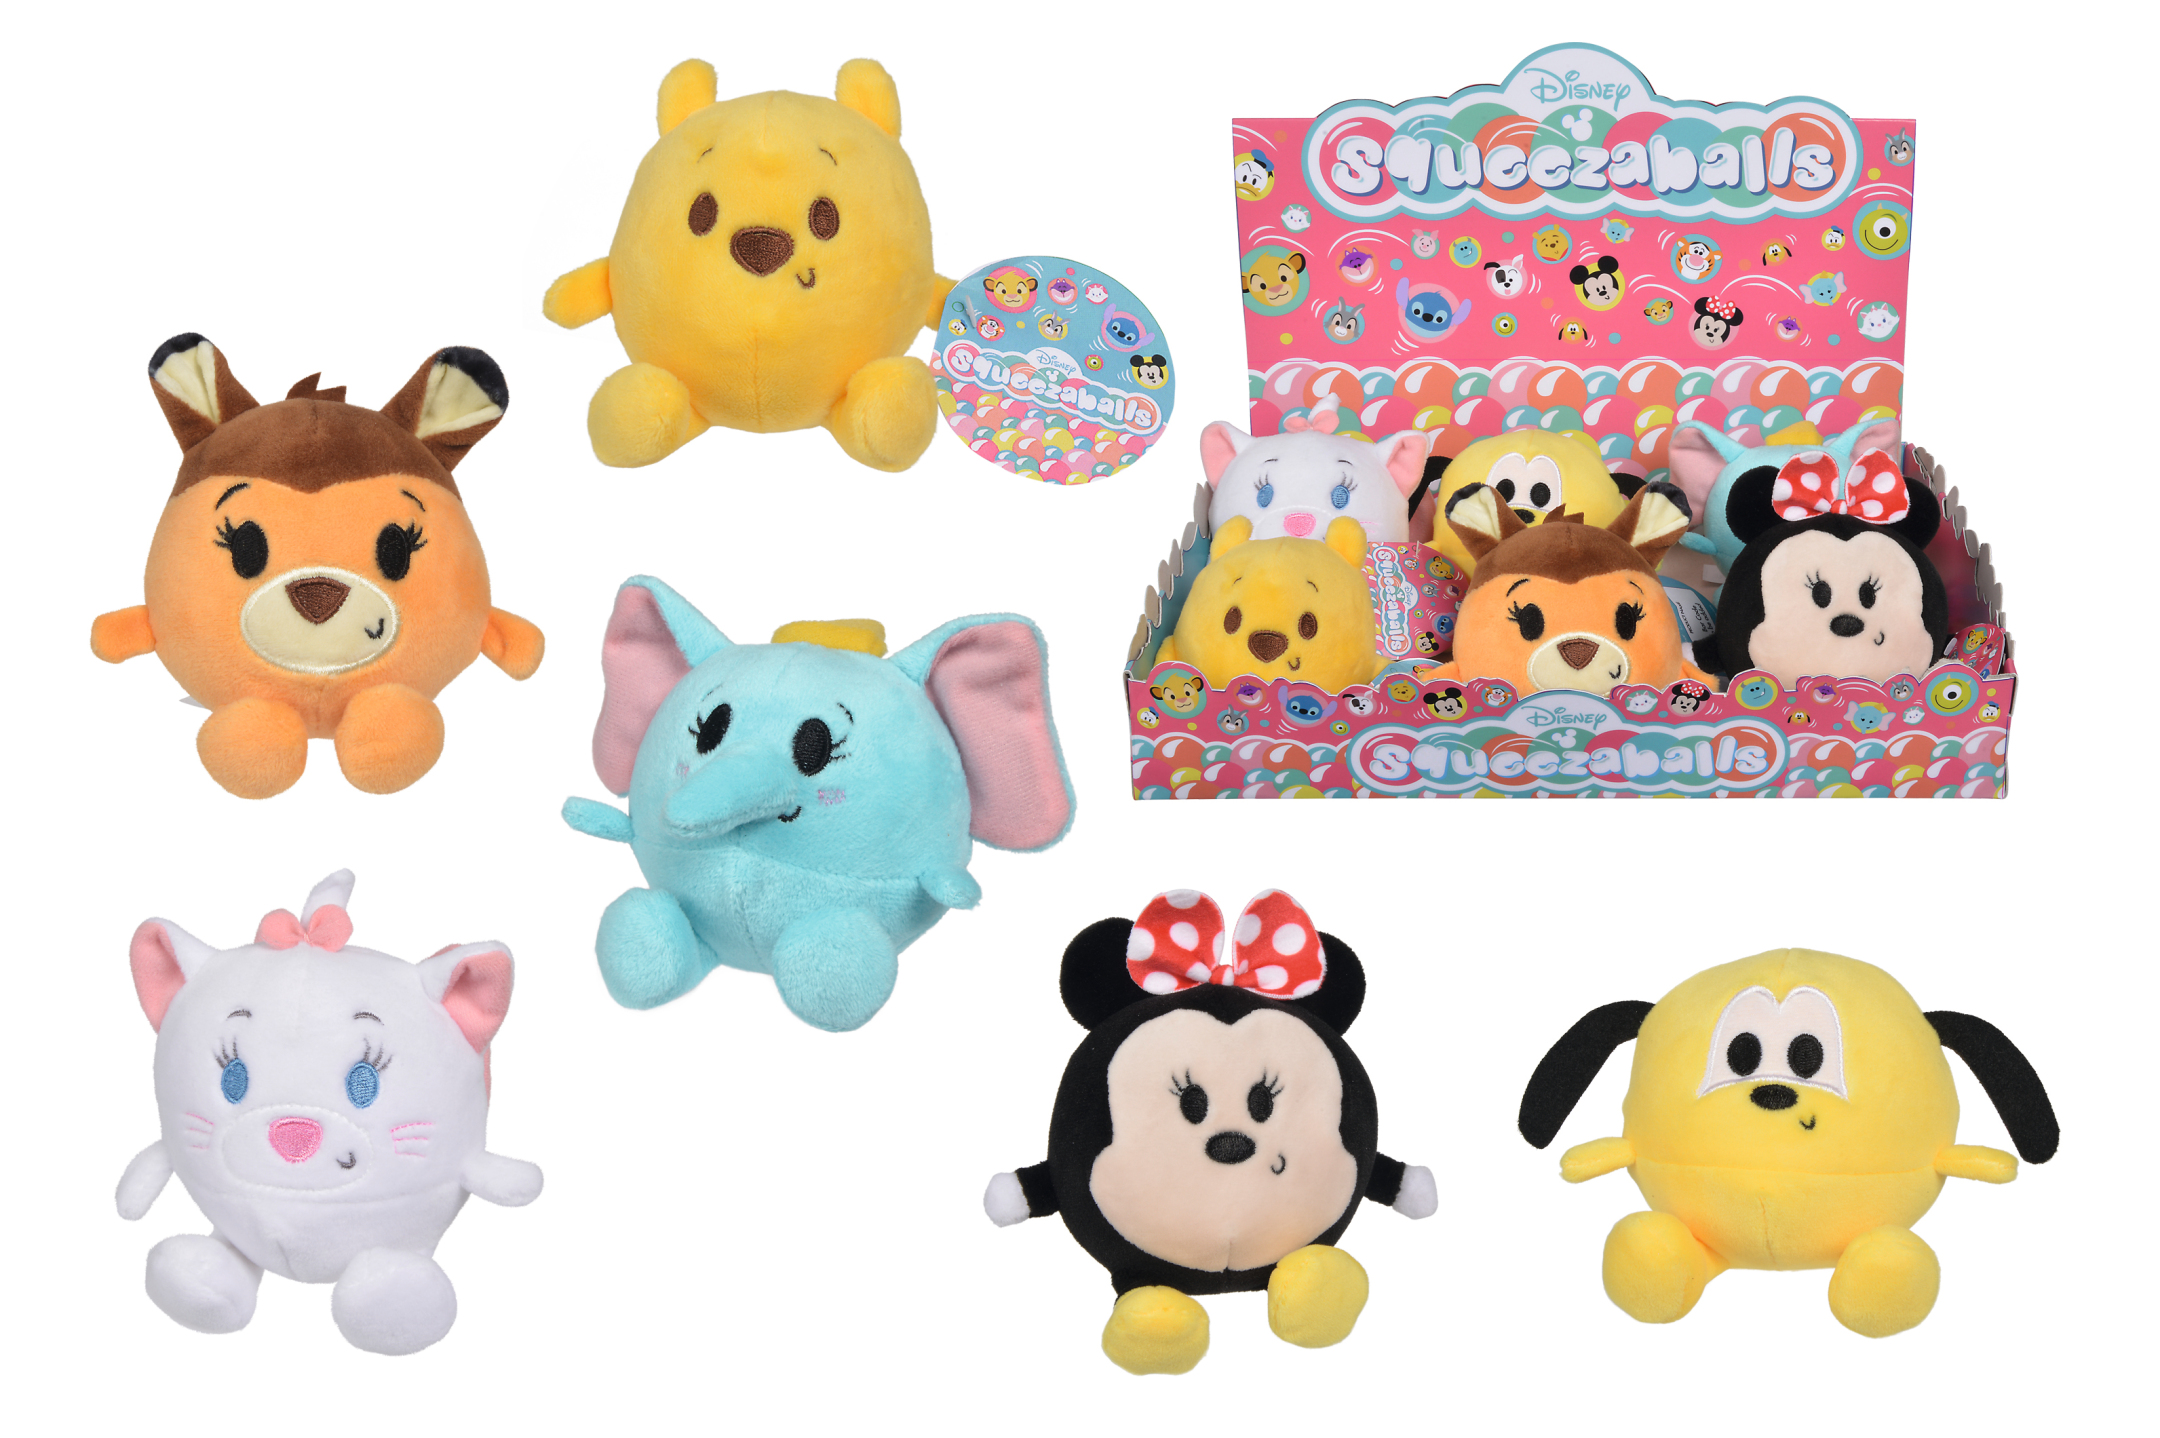 Disney Squeezaballs 6fs